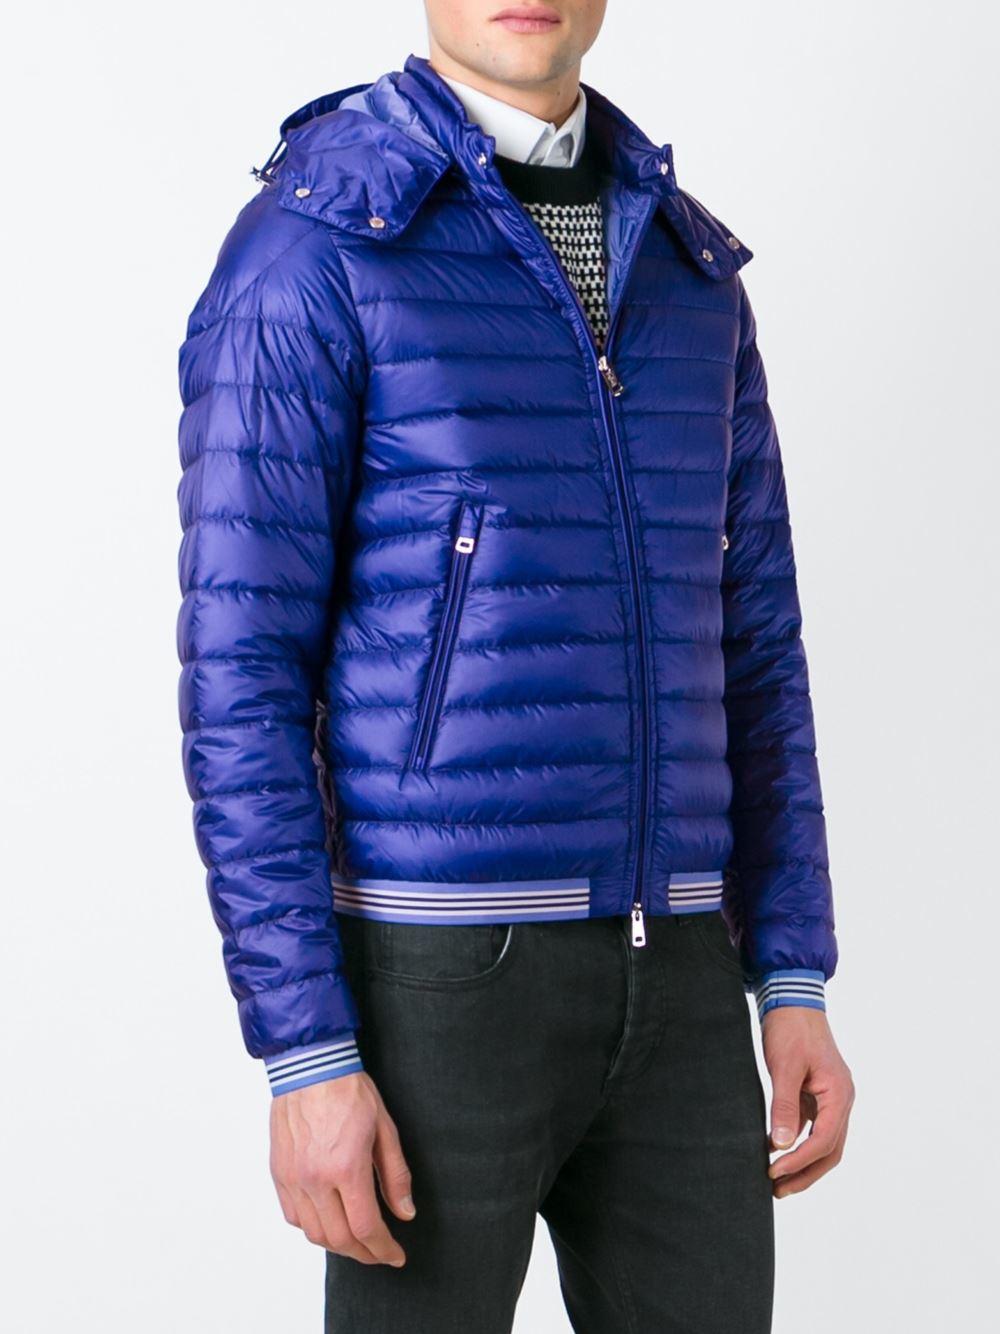 Moncler Hooded Padded Jacket In Blue For Men Lyst